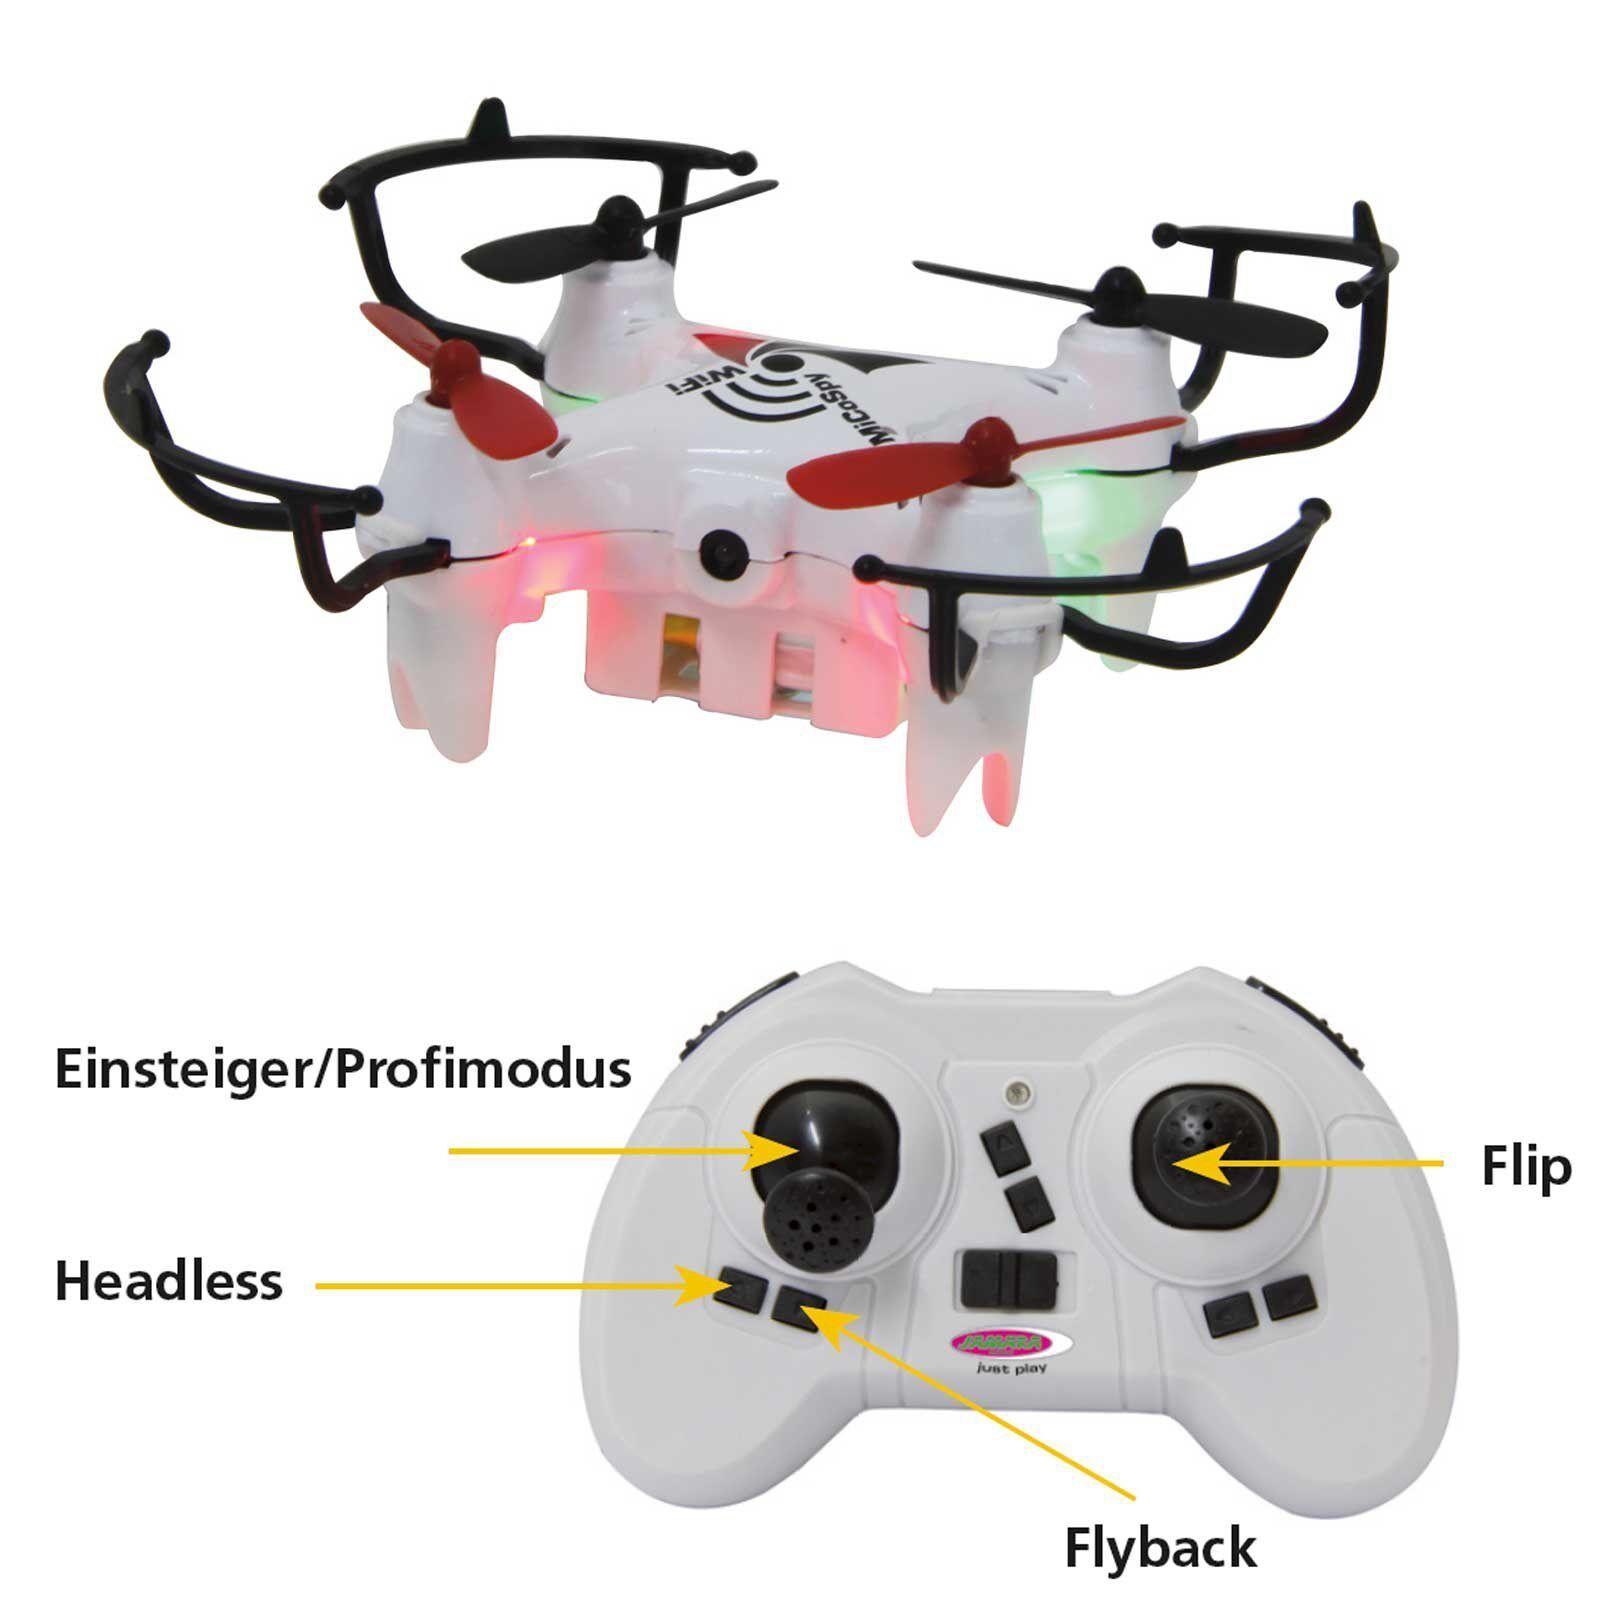 Jamara micospy FPV WI-FI Quadrocopter, rosso-bianco